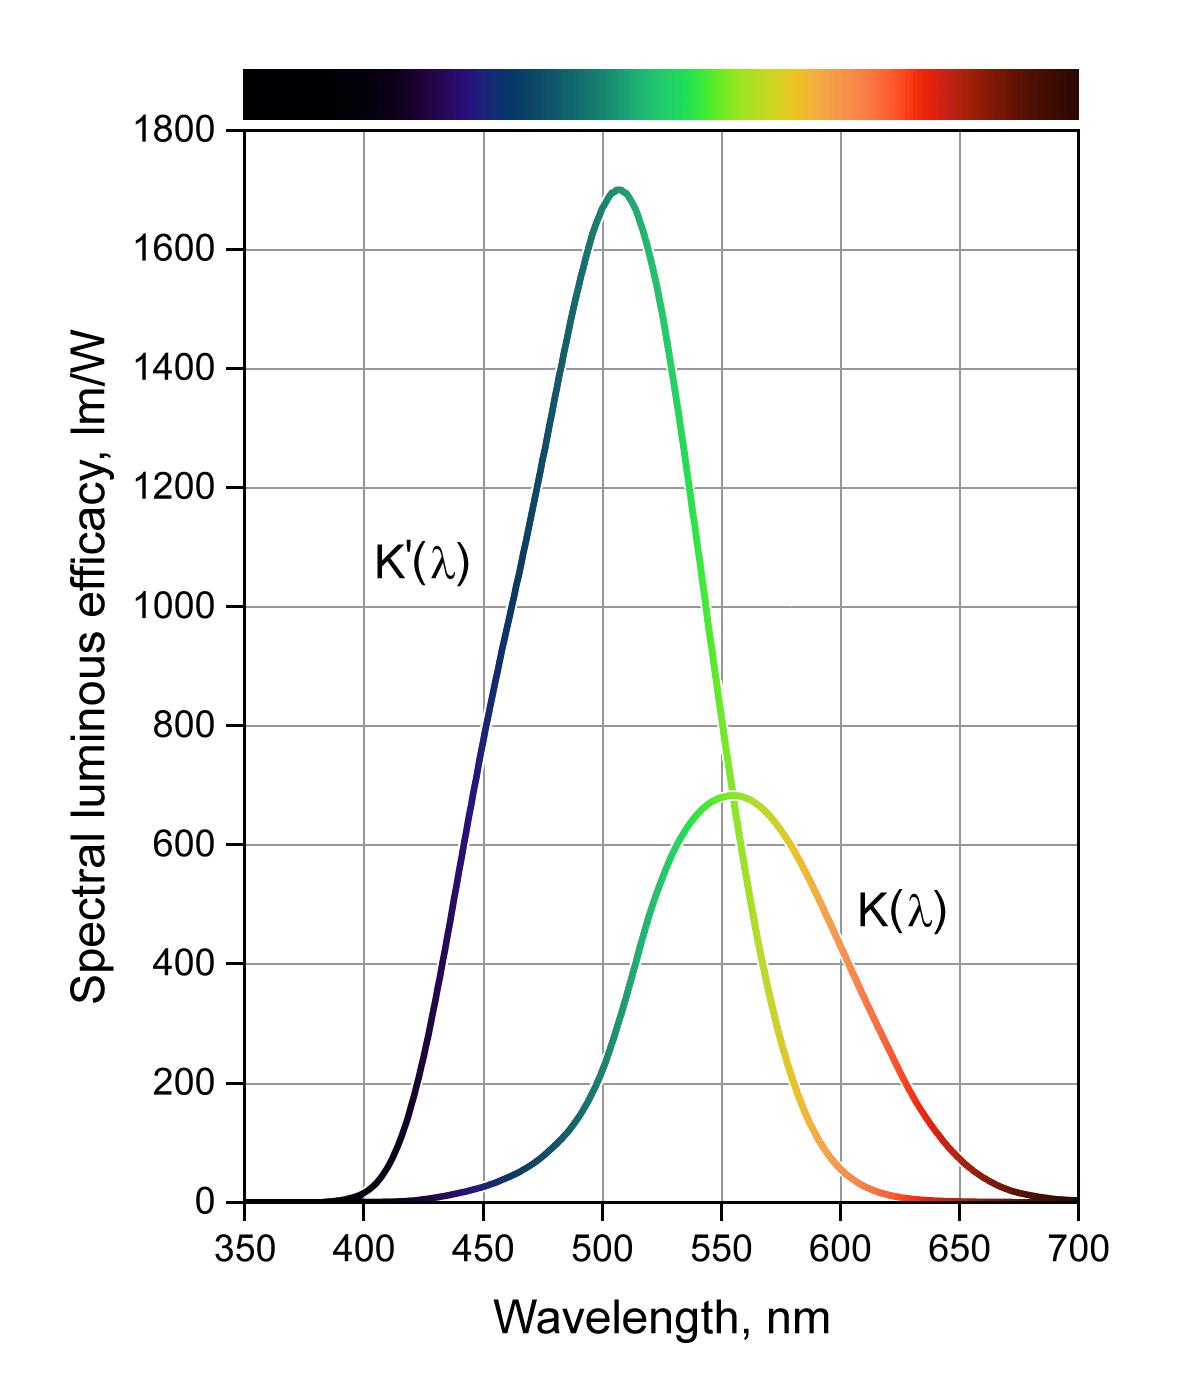 Courbe efficacite des yeux, diurne et nocturne © Sch - Wikipedia